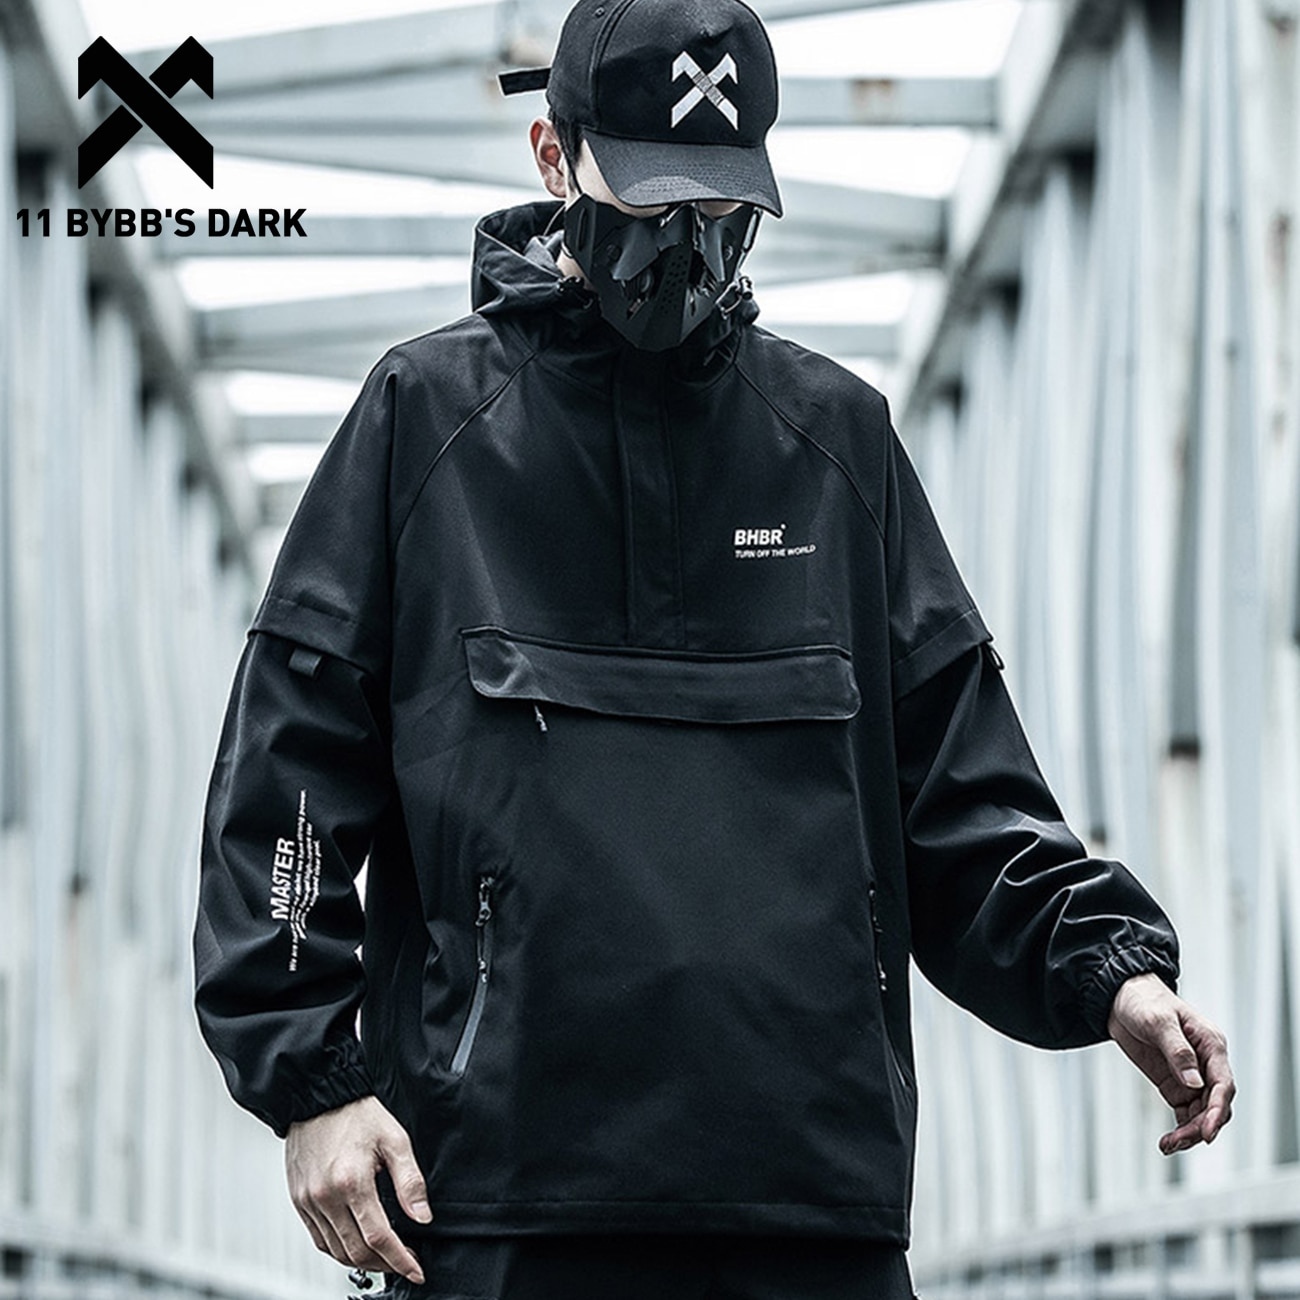 11 BYBB'S DARK Hop Streetwear-معطف بسحاب ، جاكيت شحن متعدد الجيوب ، وظيفة تكتيكية ، سترة واقية من الرياح للخريف